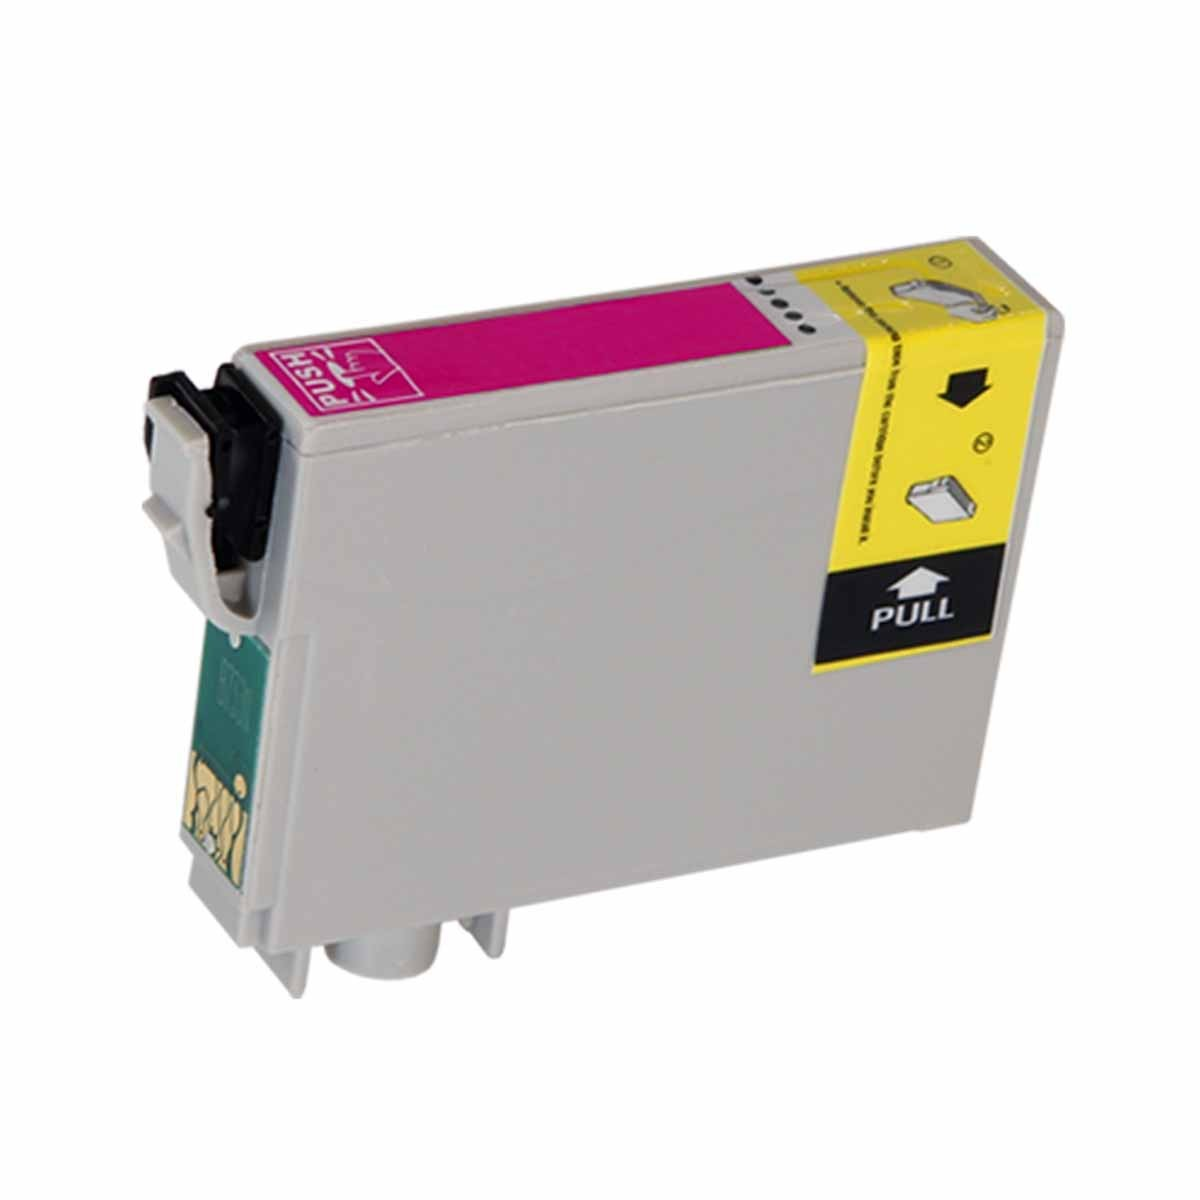 CARTUCHO EPSON T133320 T133 MAGENTA TX120/TX135/TX320F/TX125/T22/TX420W (COMPATÍVEL)